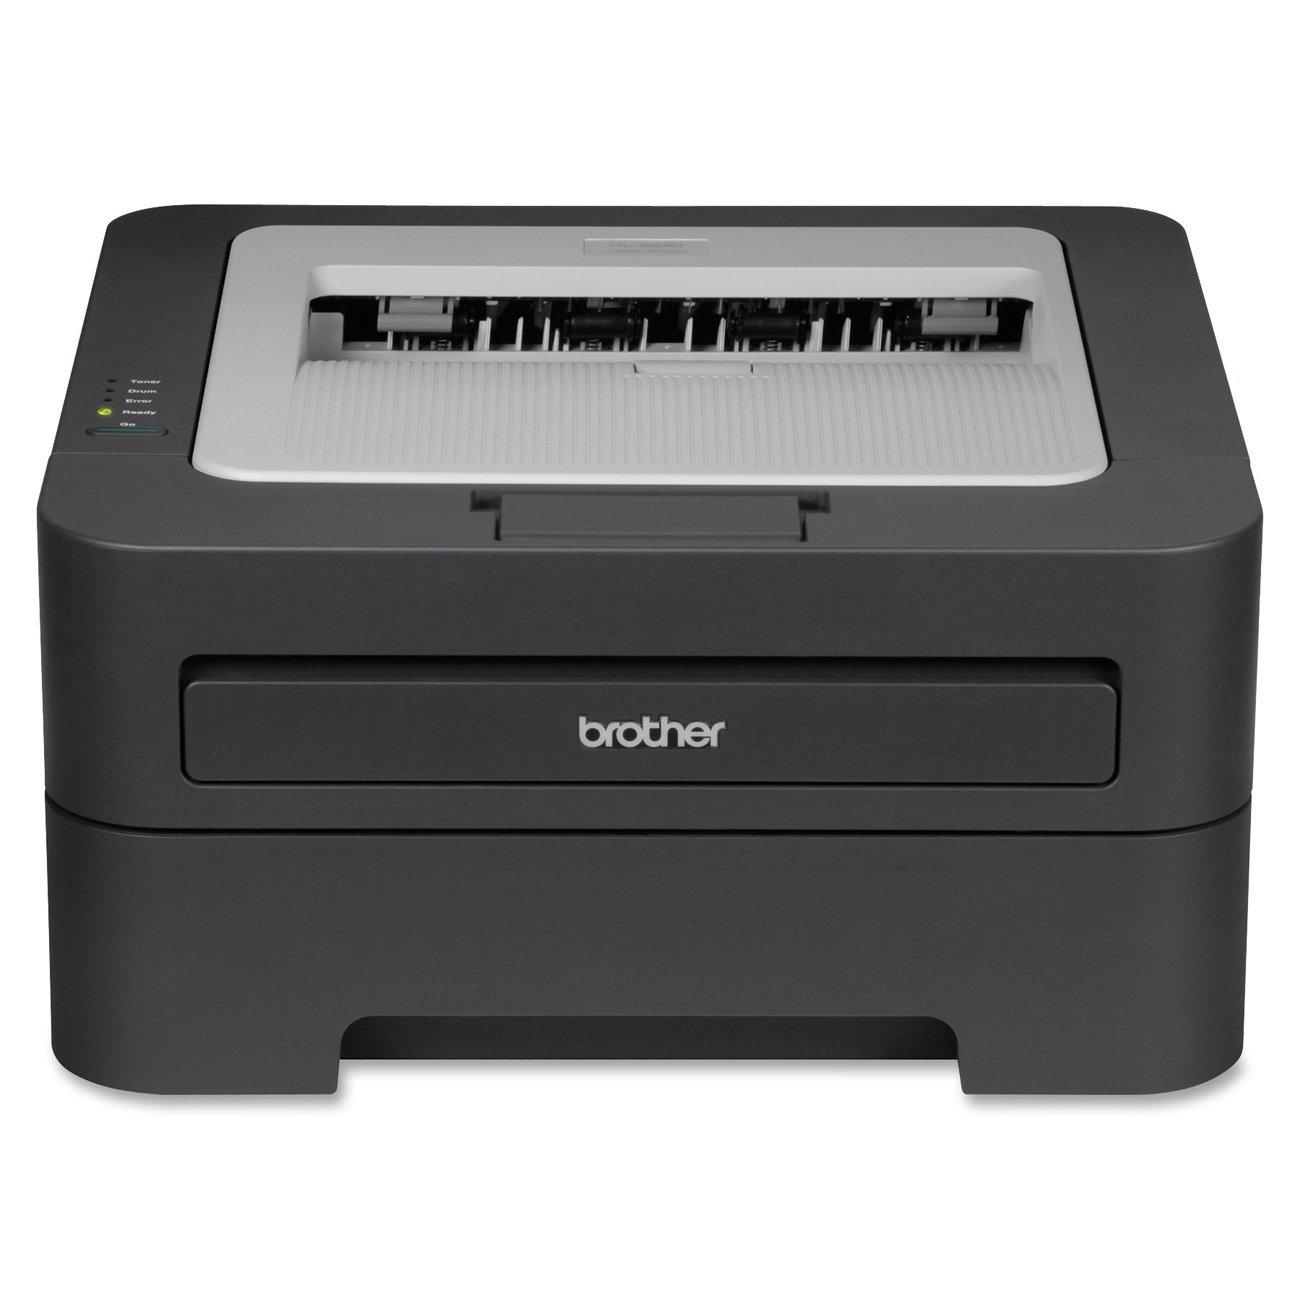 Inexpensive Laser Printer (Brother HL2230)